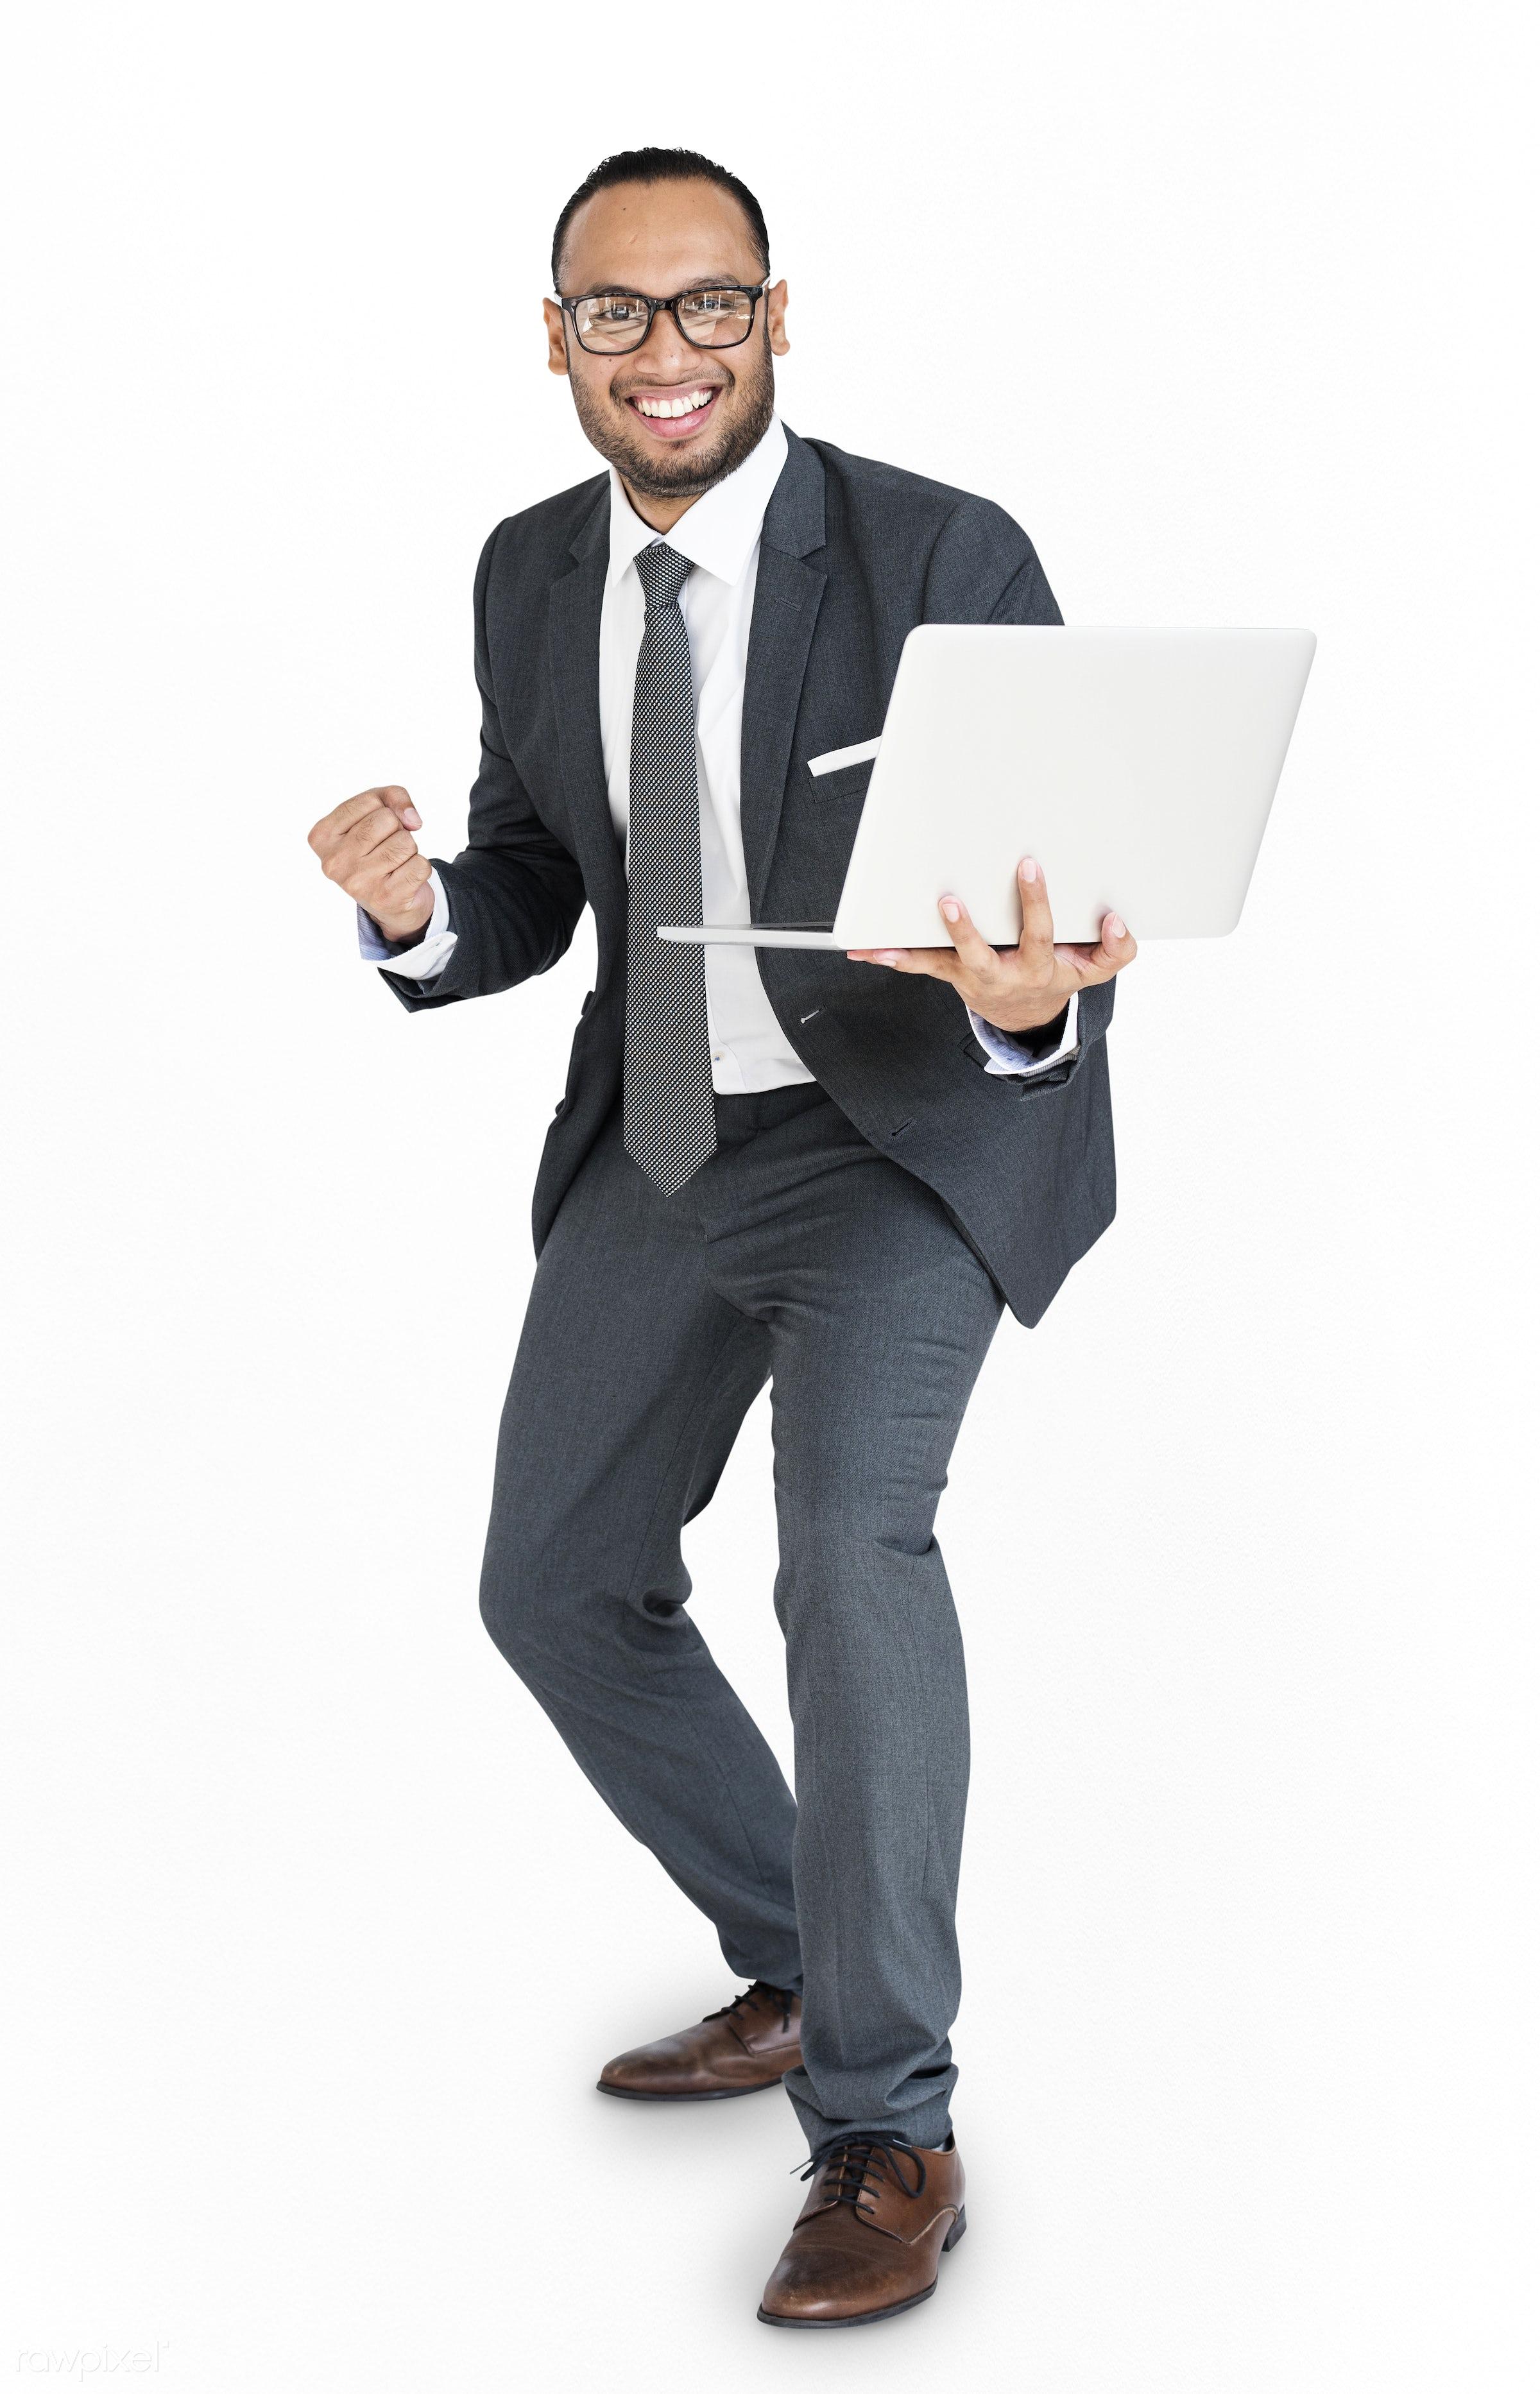 expression, studio, person, idea, business wear, achieve, people, business, asian, happy, laptop, brainstorm, smile,...